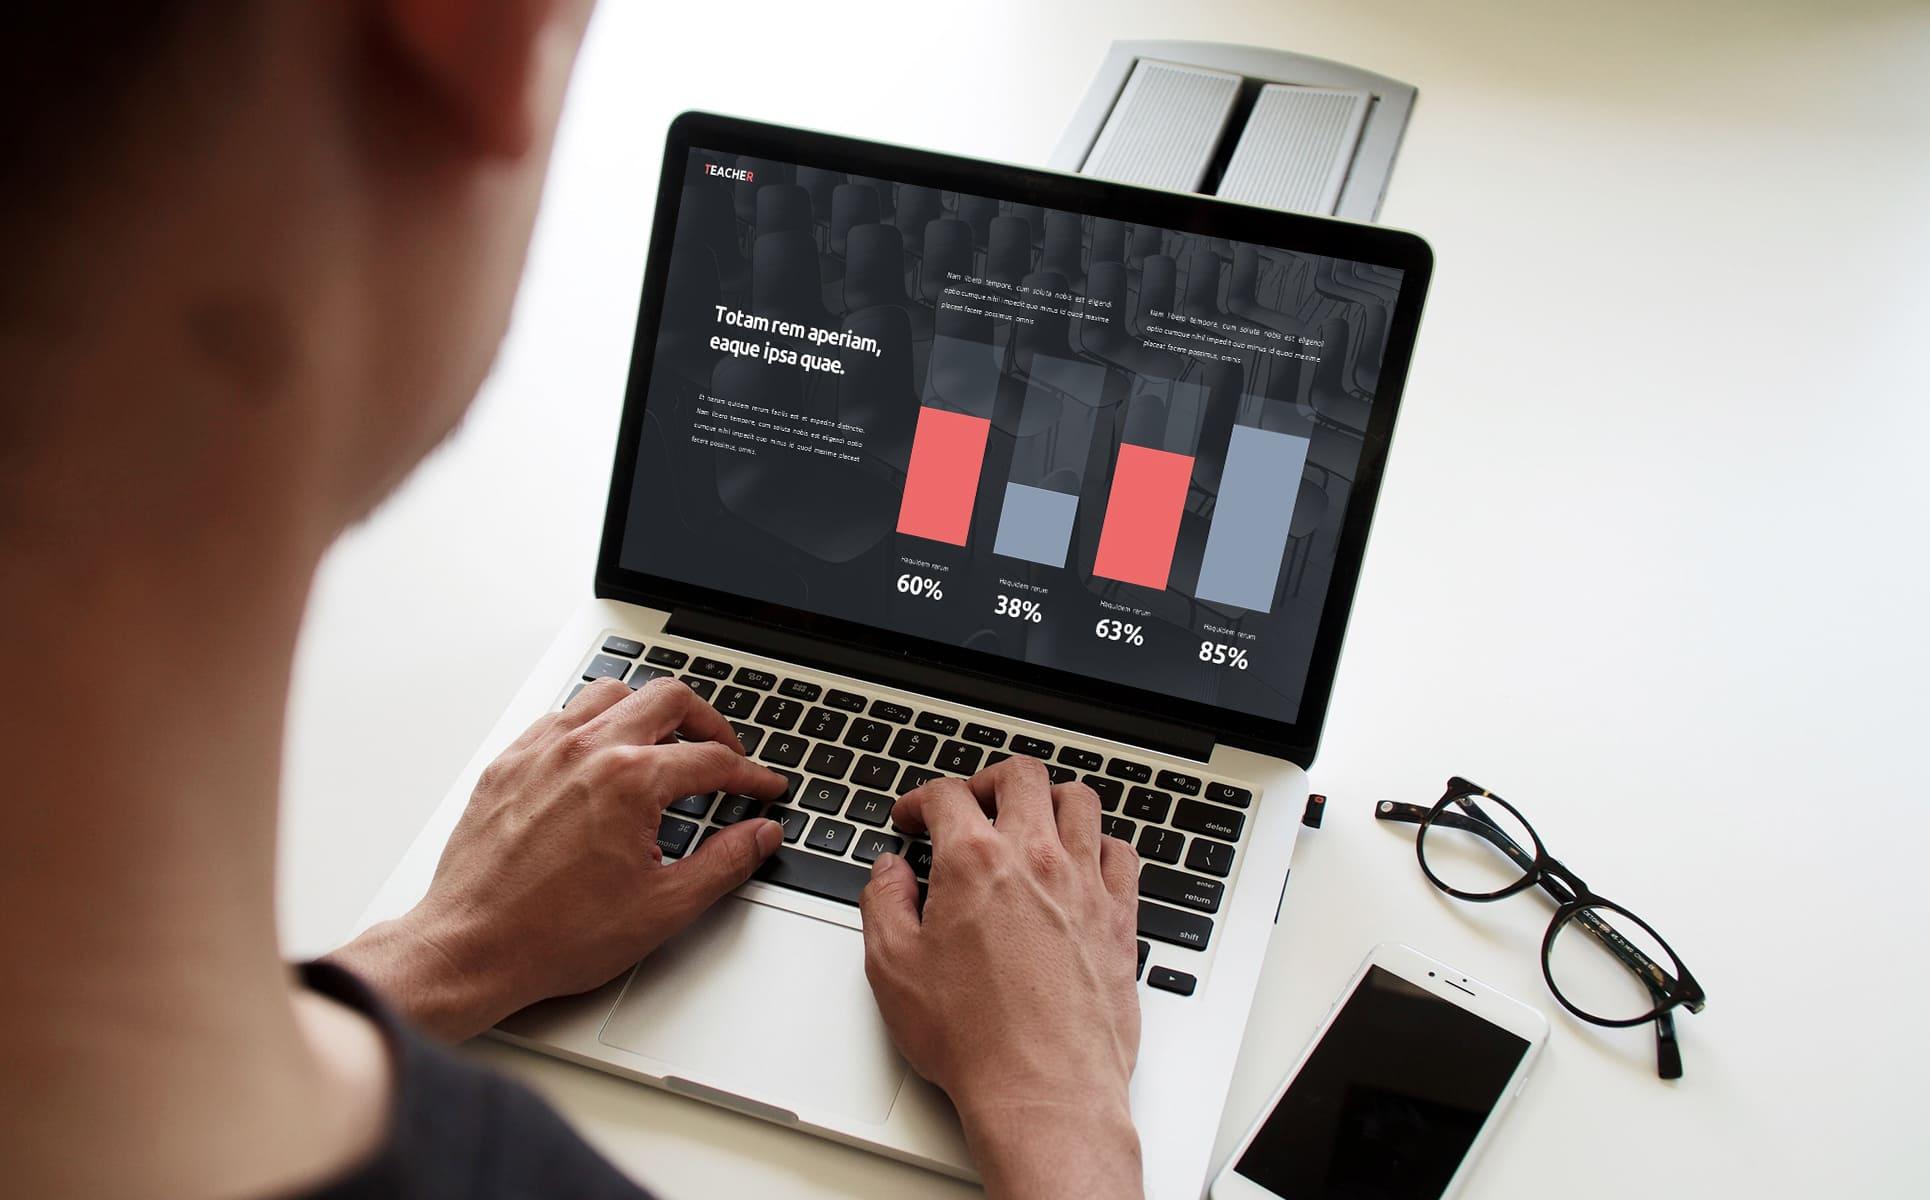 50 Slides Teacher Presentation Template by MasterBundles preview mockup image on laptop.